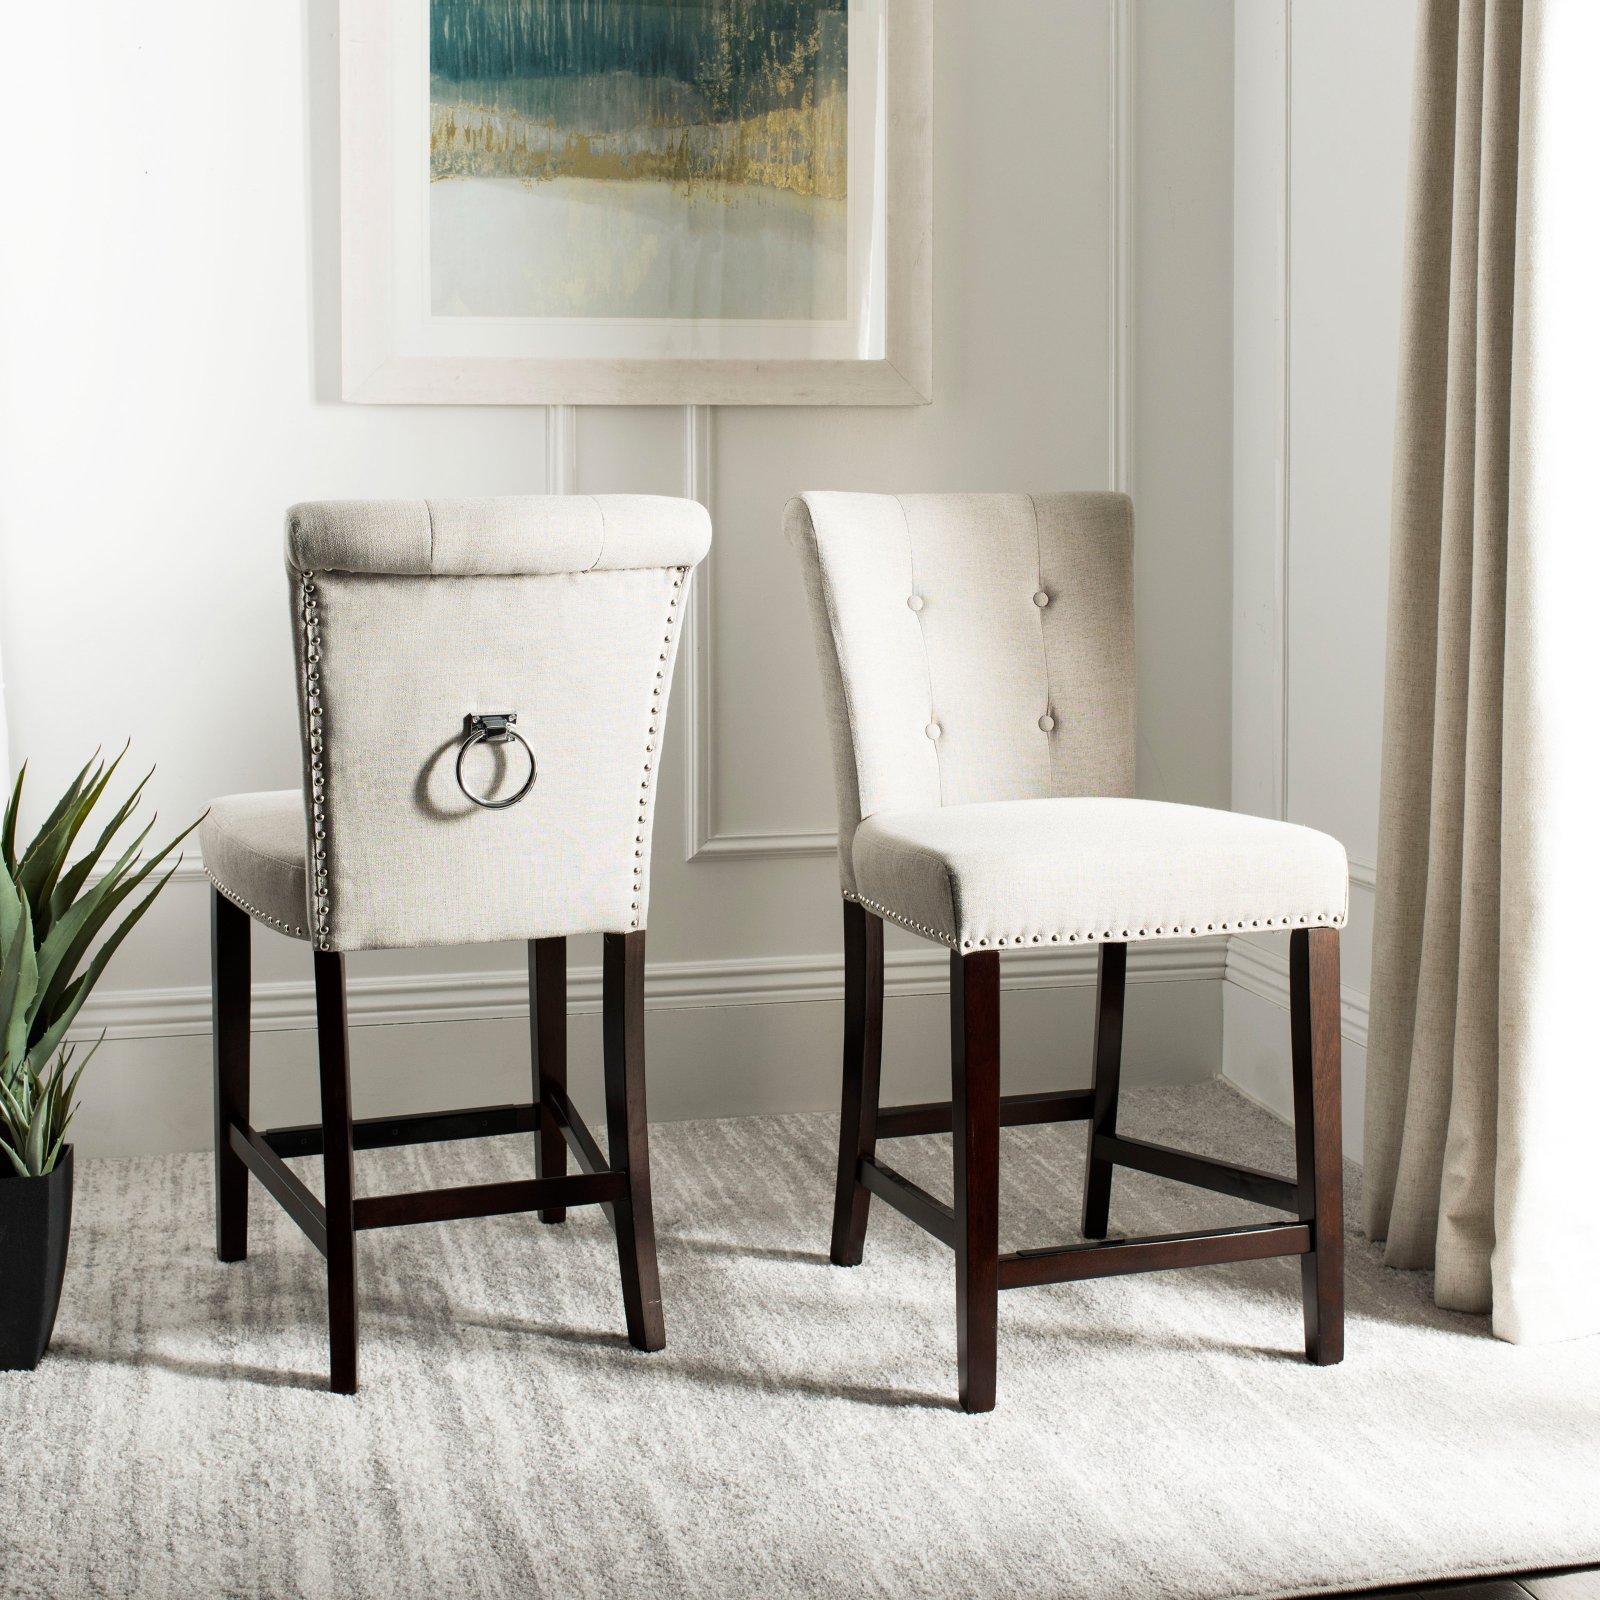 Prime Safavieh Taylor 26 In Counter Stool Set Of 2 Light Gray Bralicious Painted Fabric Chair Ideas Braliciousco